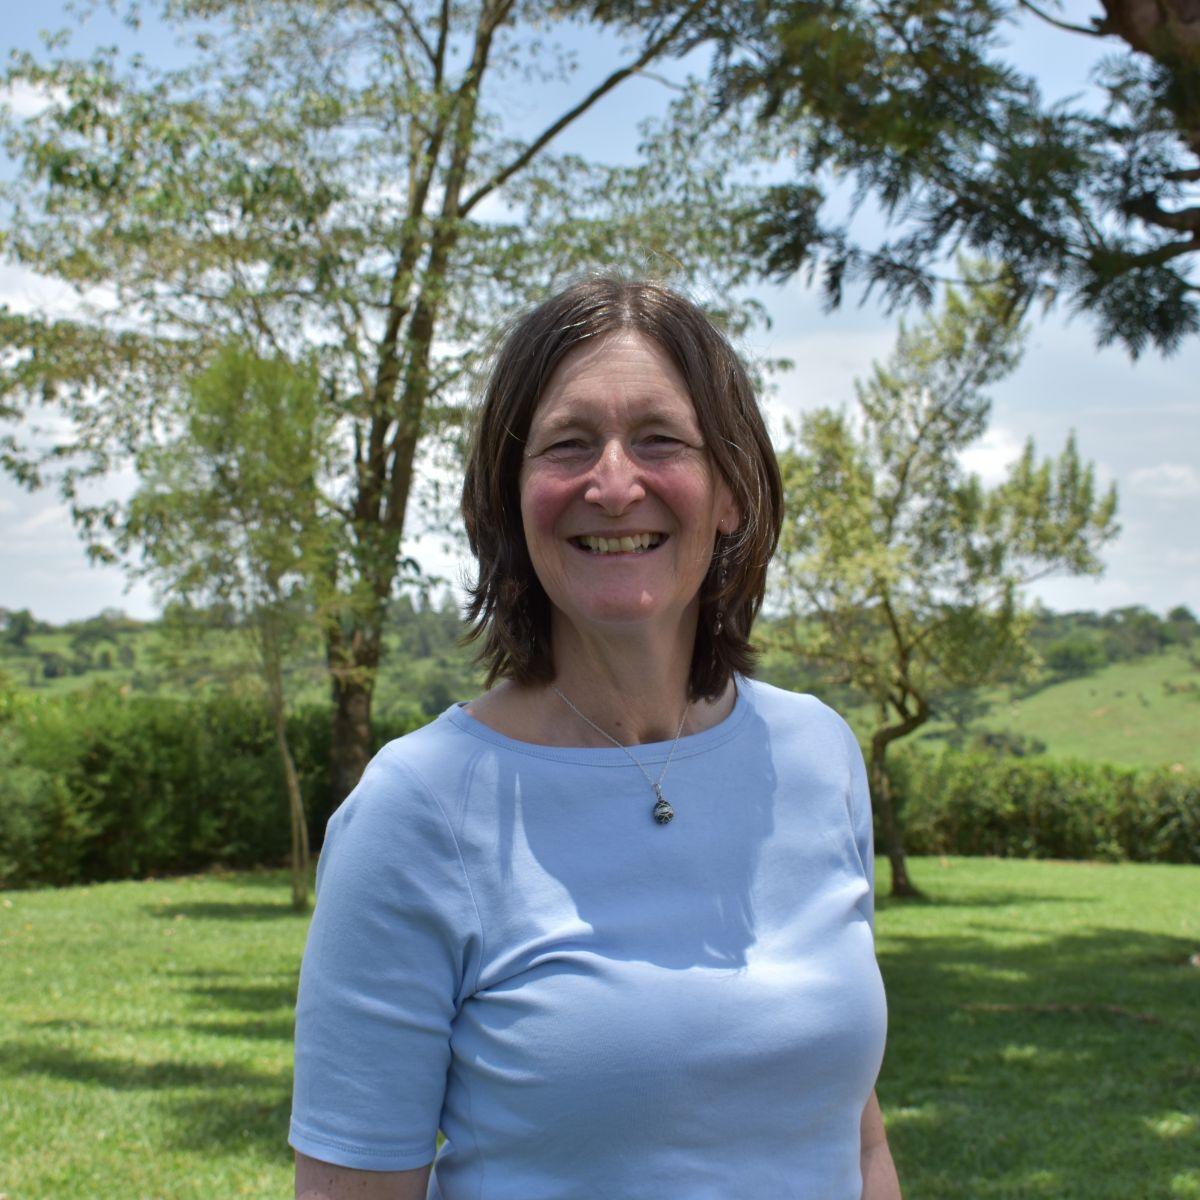 Fiona Bristow